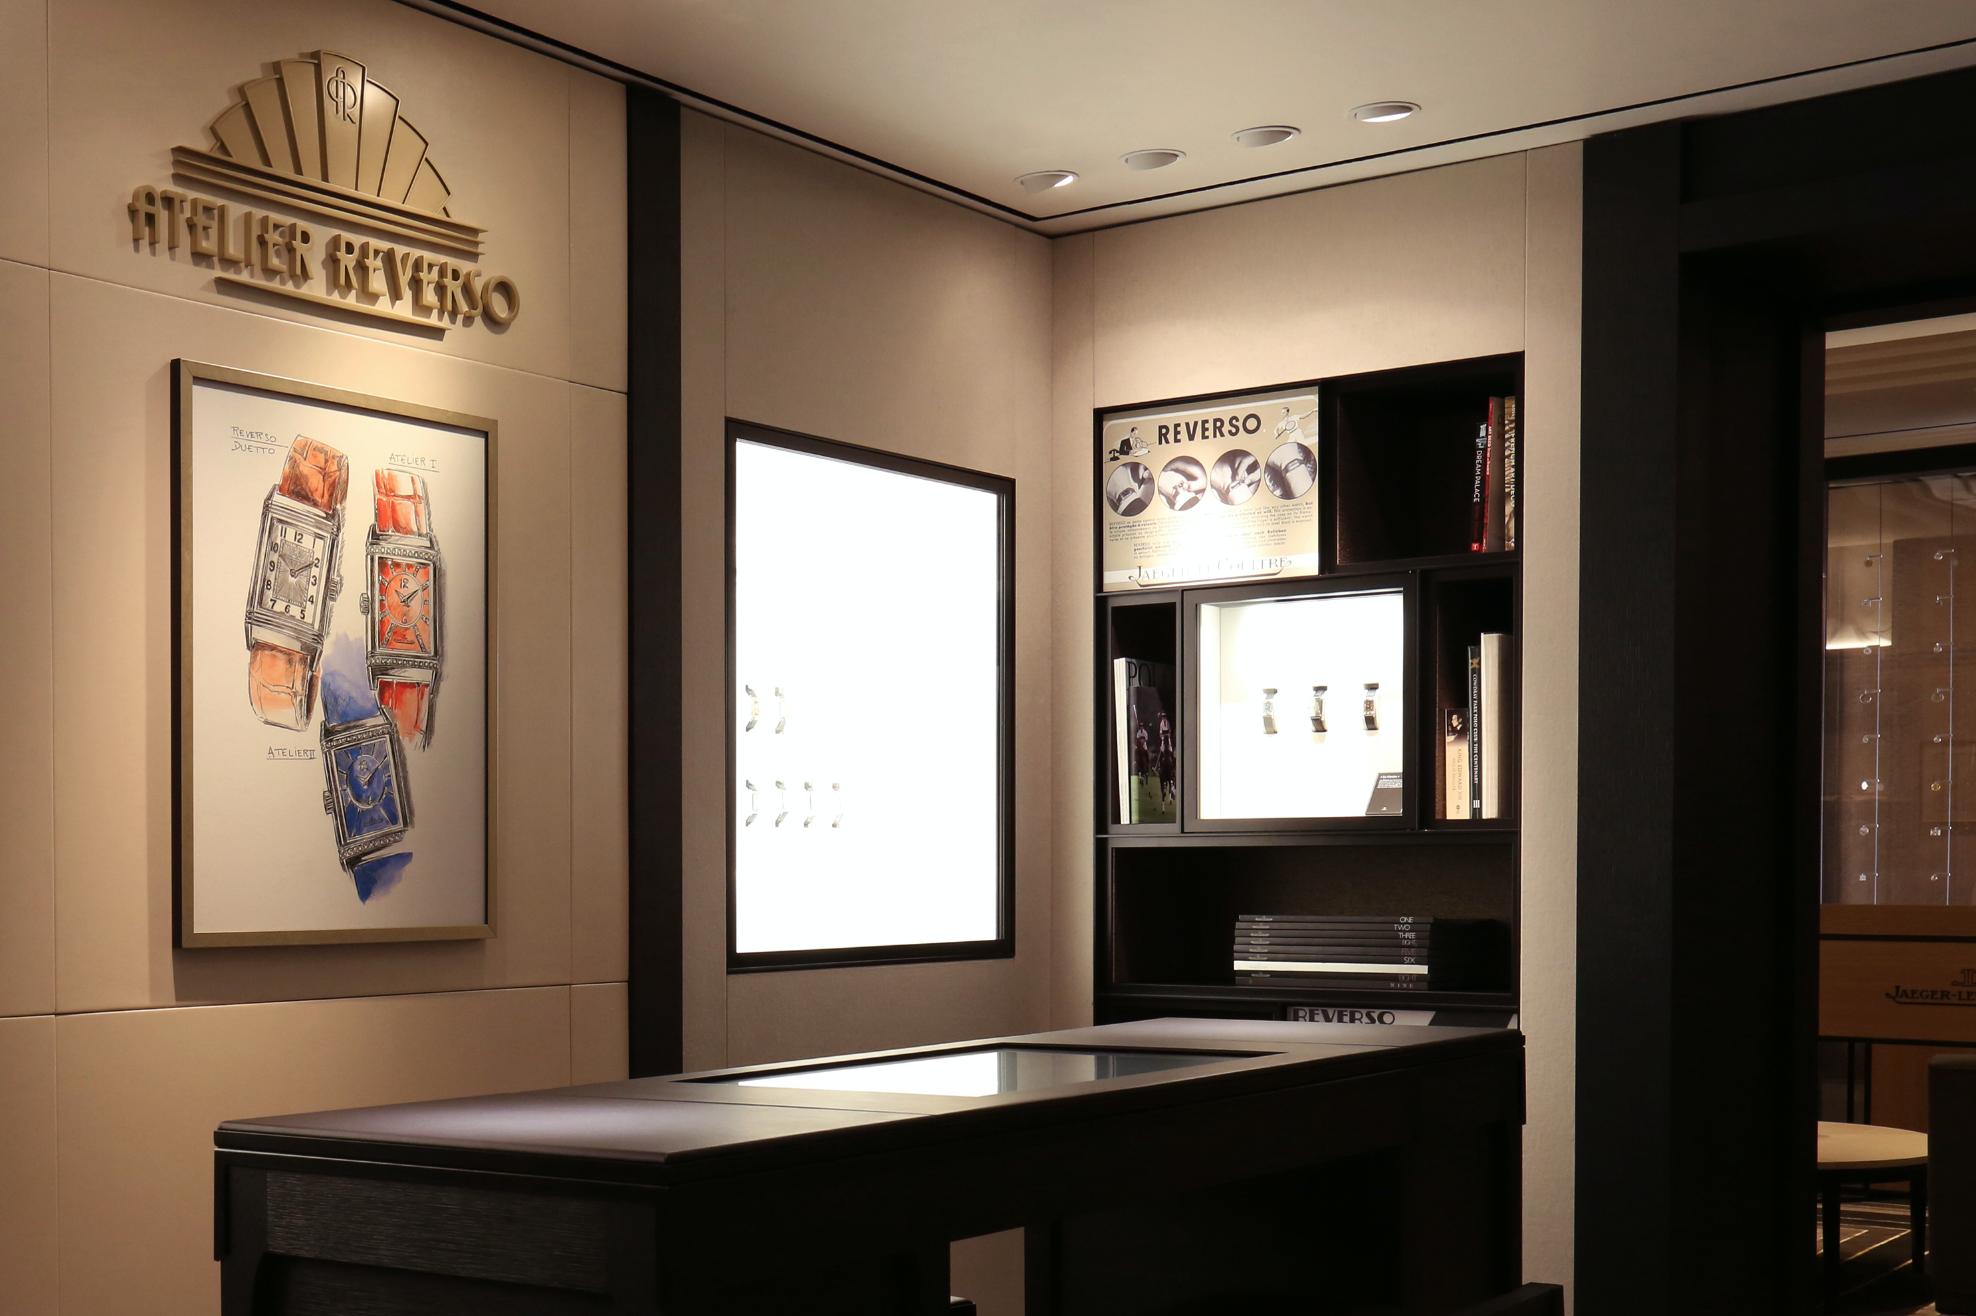 Atelier Reverso, Jaeger-LeCoultre Flagship Boutique in London (2)